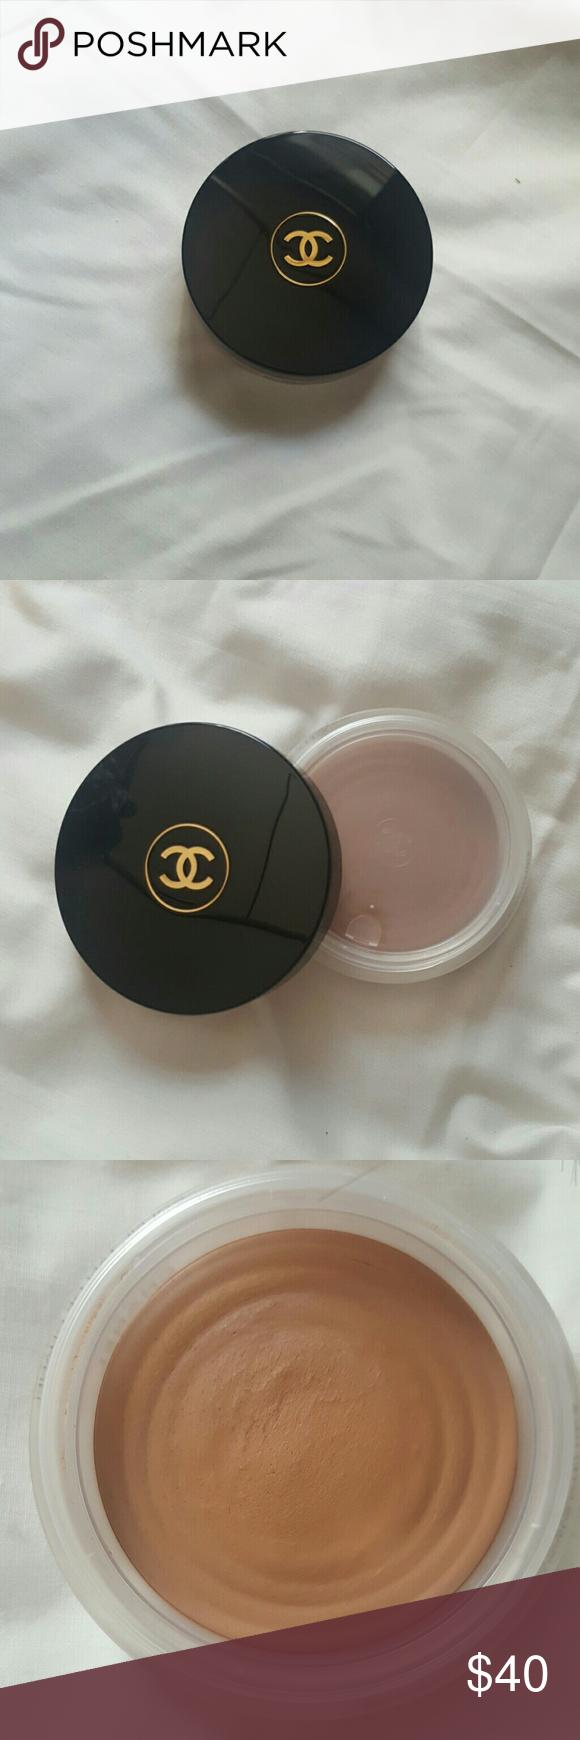 CHANEL SOLEIL TAN DE CHANEL BRONZING MAKEUP BASE Chanel